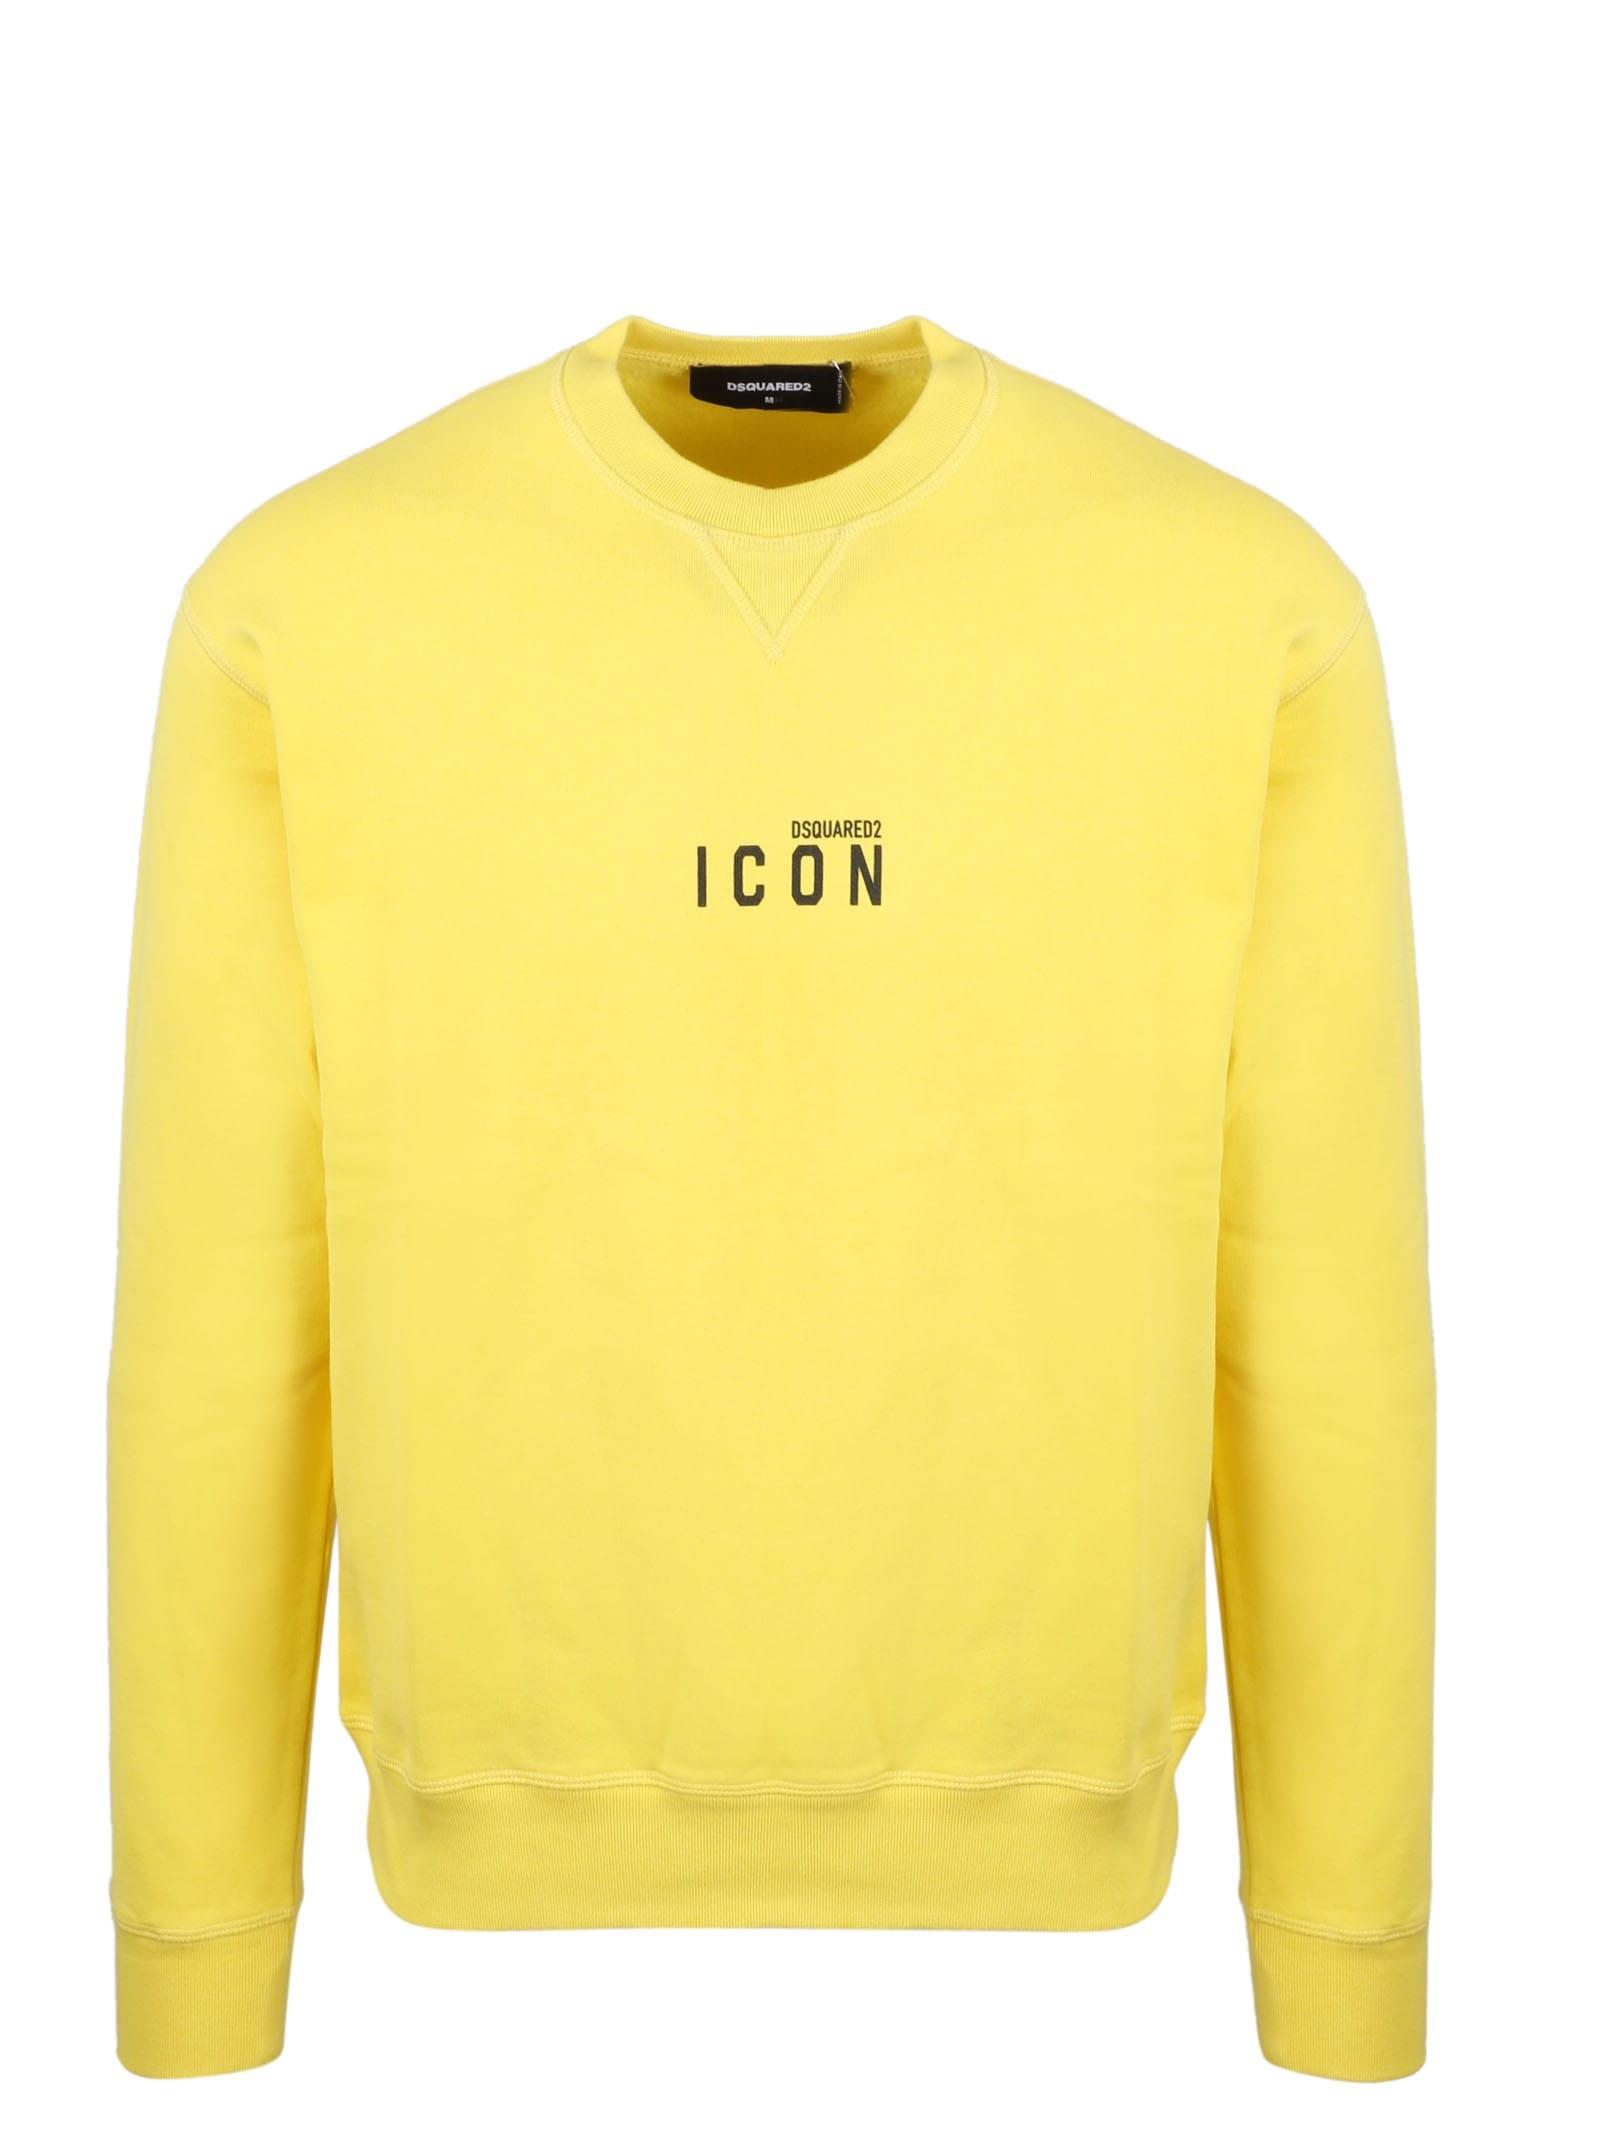 Dsquared2 Sweatshirts BE ICON SWEATSHIRT